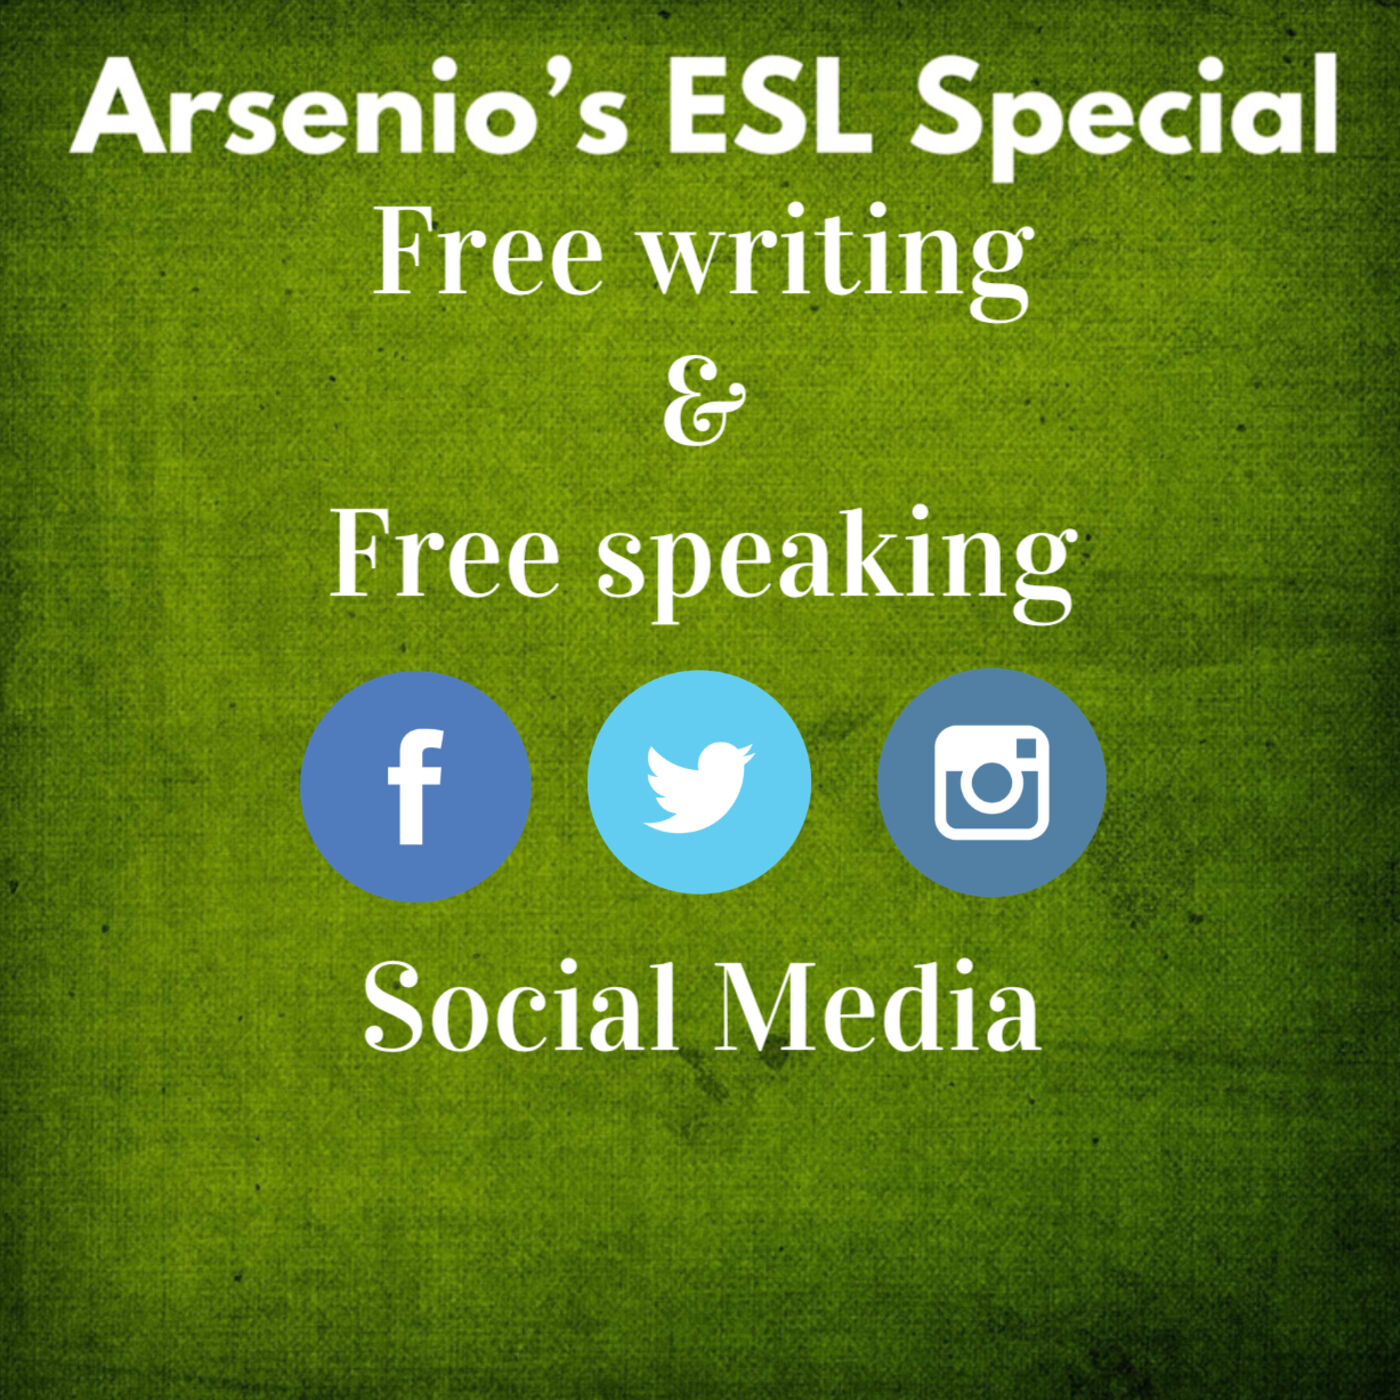 Arsenio's ESL Podcast: Special - Freewriting/Freespeaking - Social Media